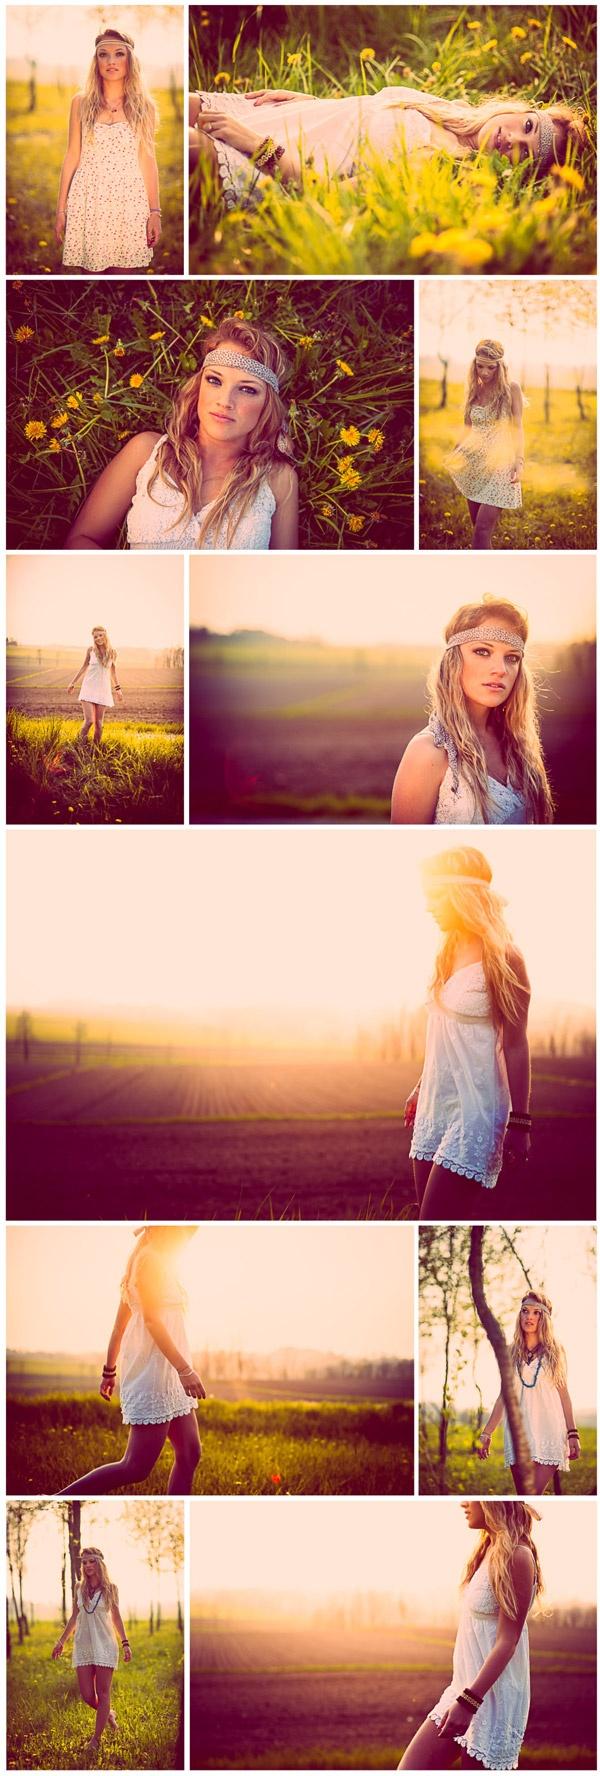 hippie fashion wonderful young girl